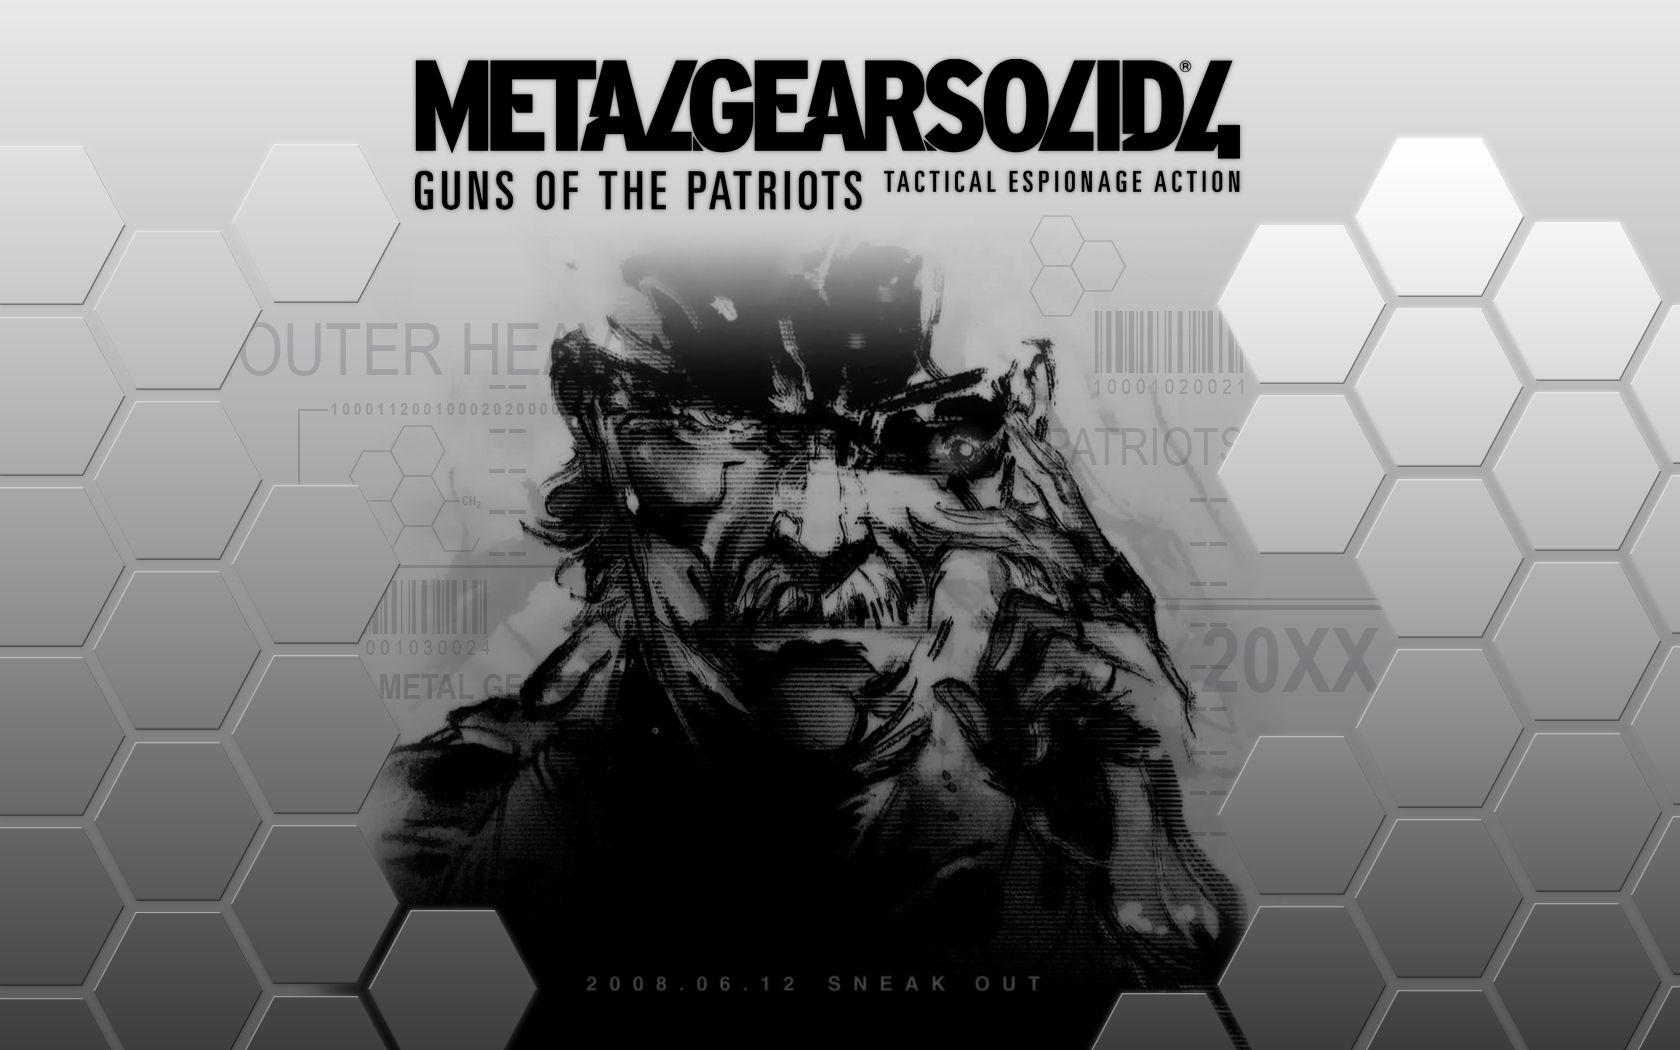 Metal Gear Solid - Guns of the Patriots